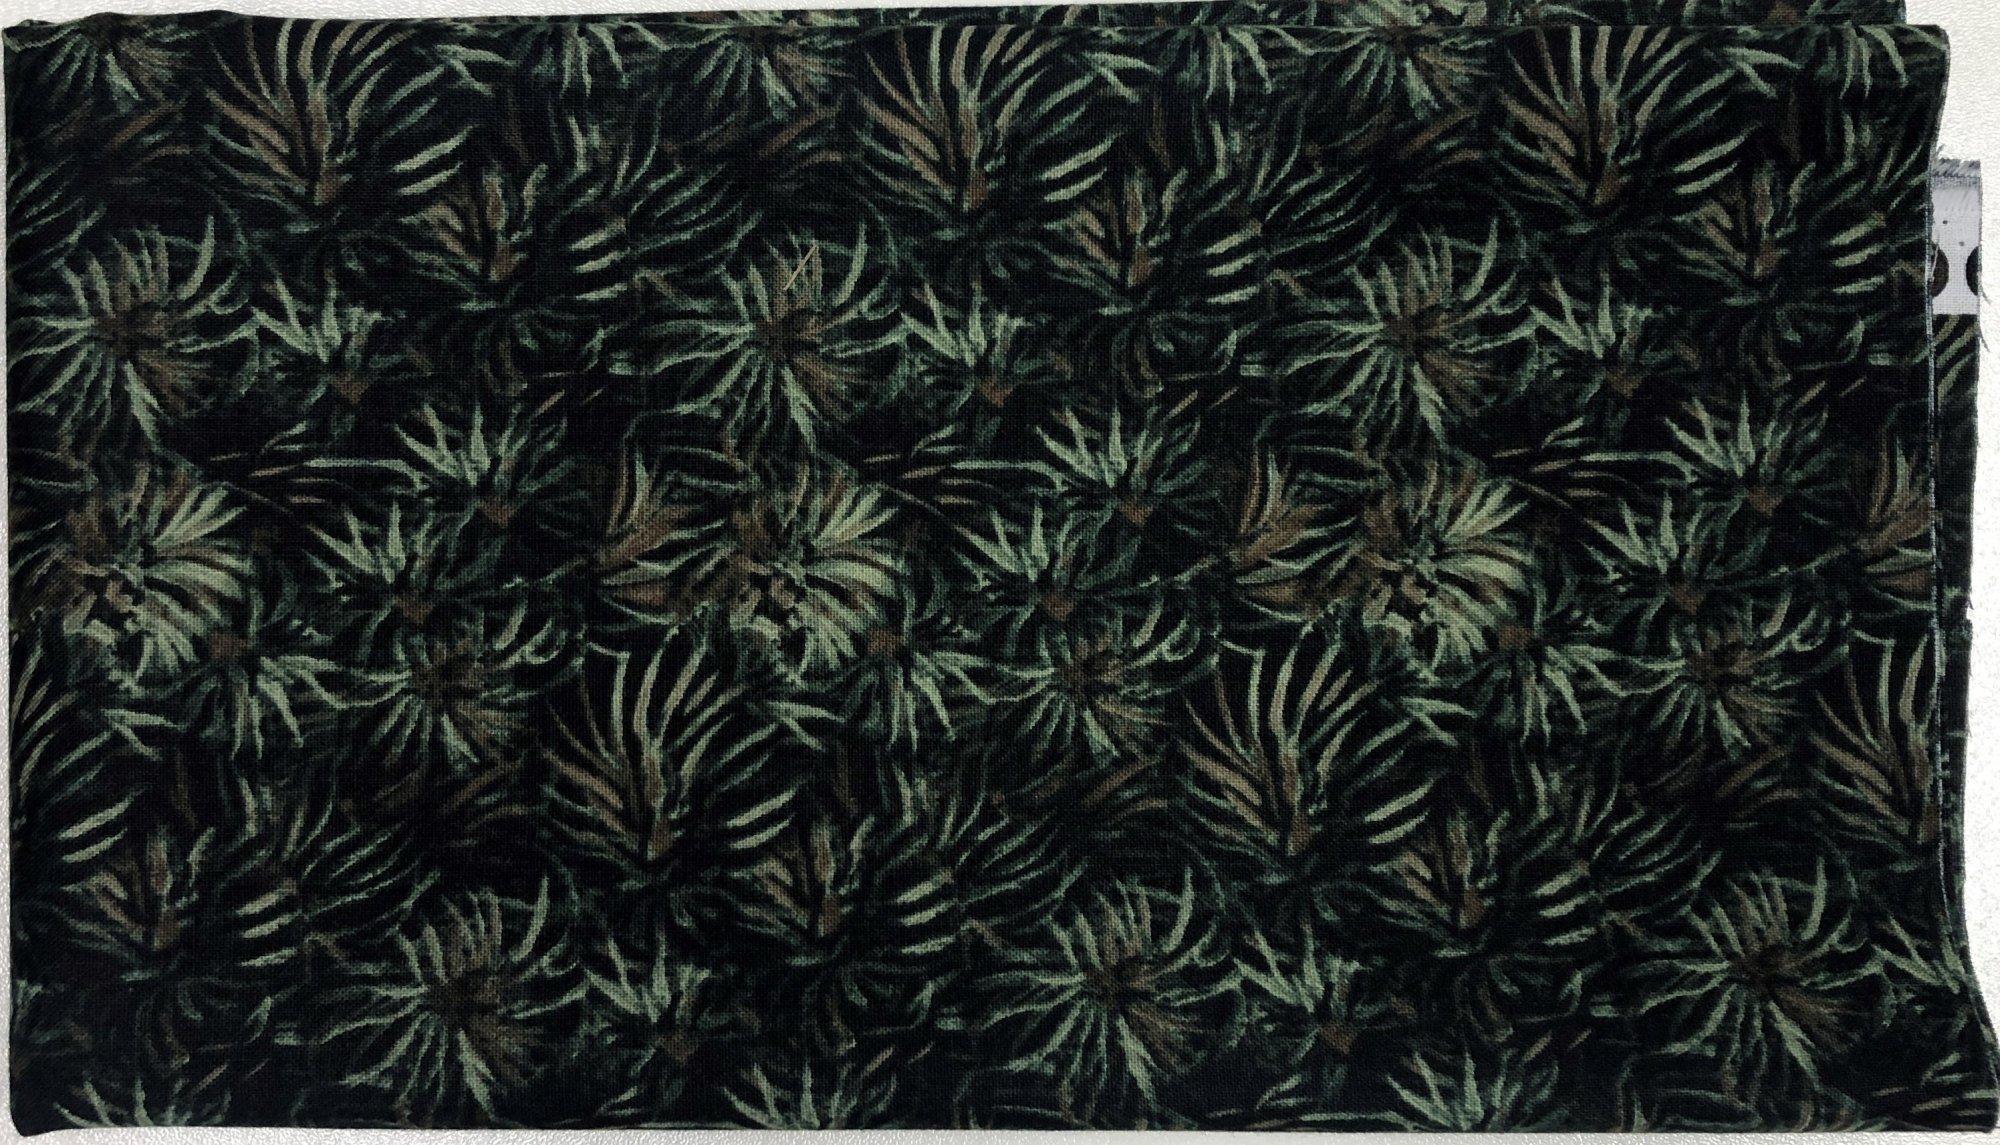 Spruce Pines - Pre-cut 1/2 meter 20x42 - PC013